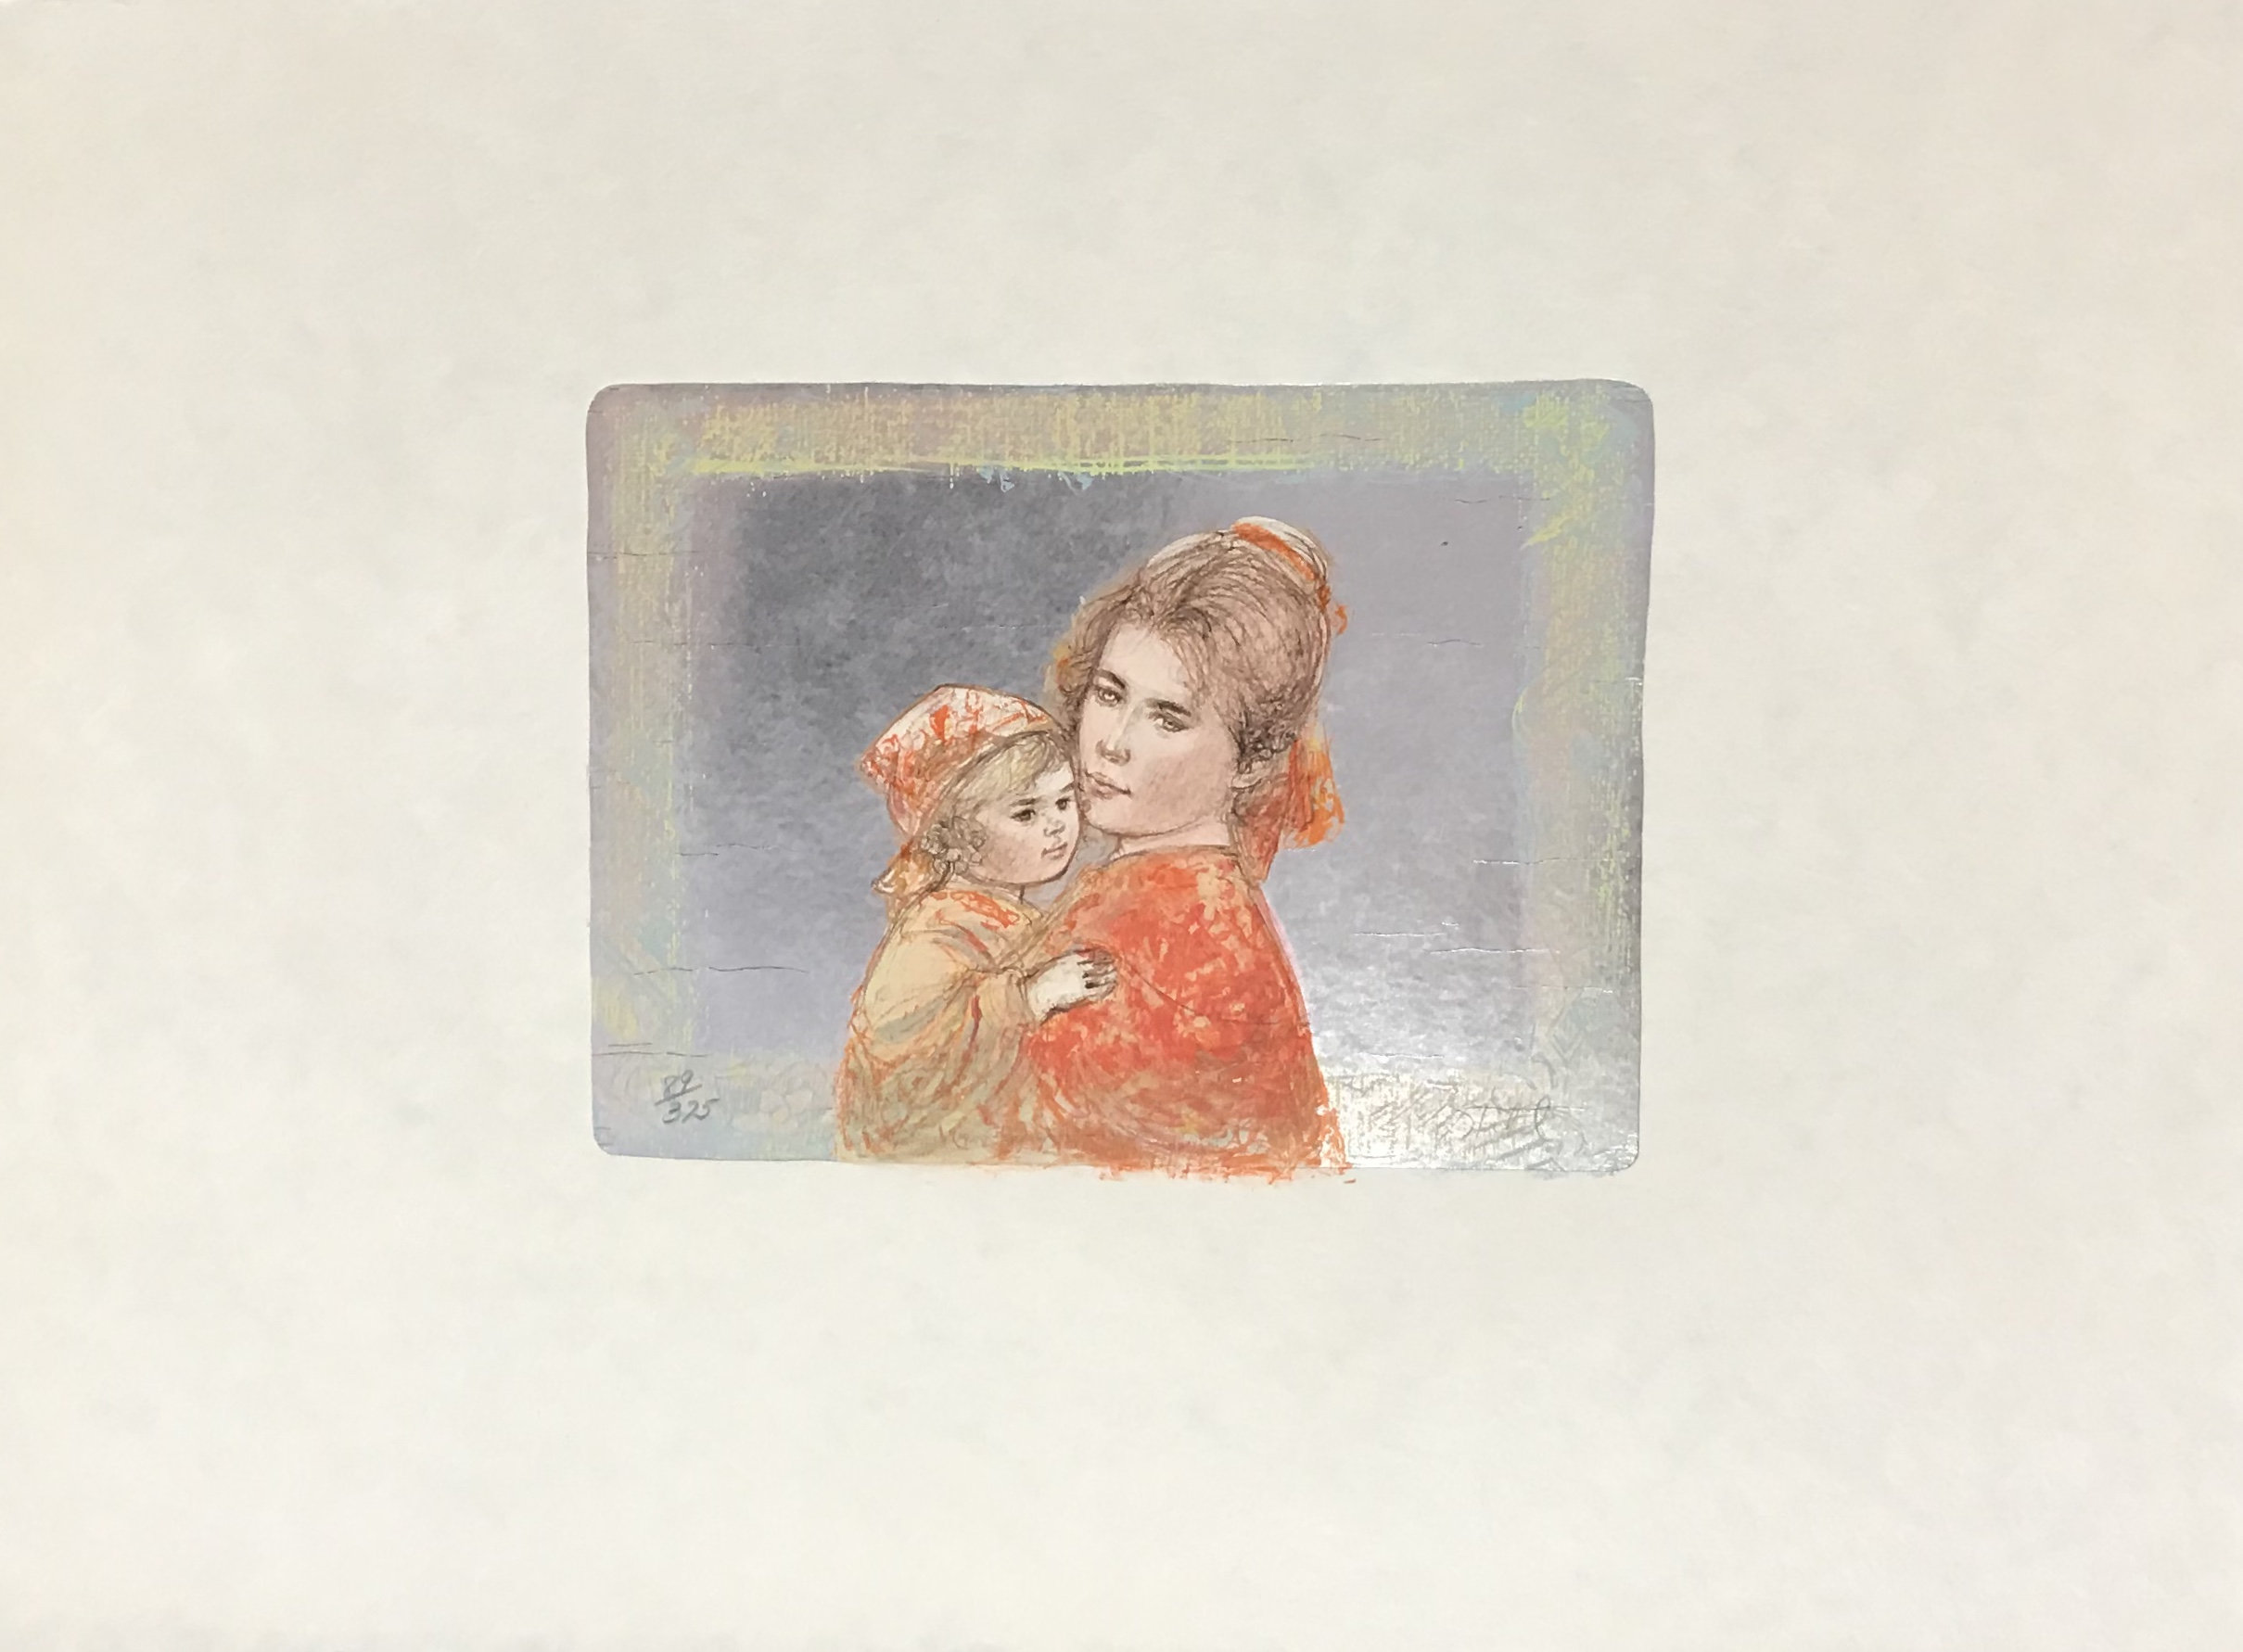 Edna Hibel, Martha & Iris 1977, Pencil Signed Original Lithograph